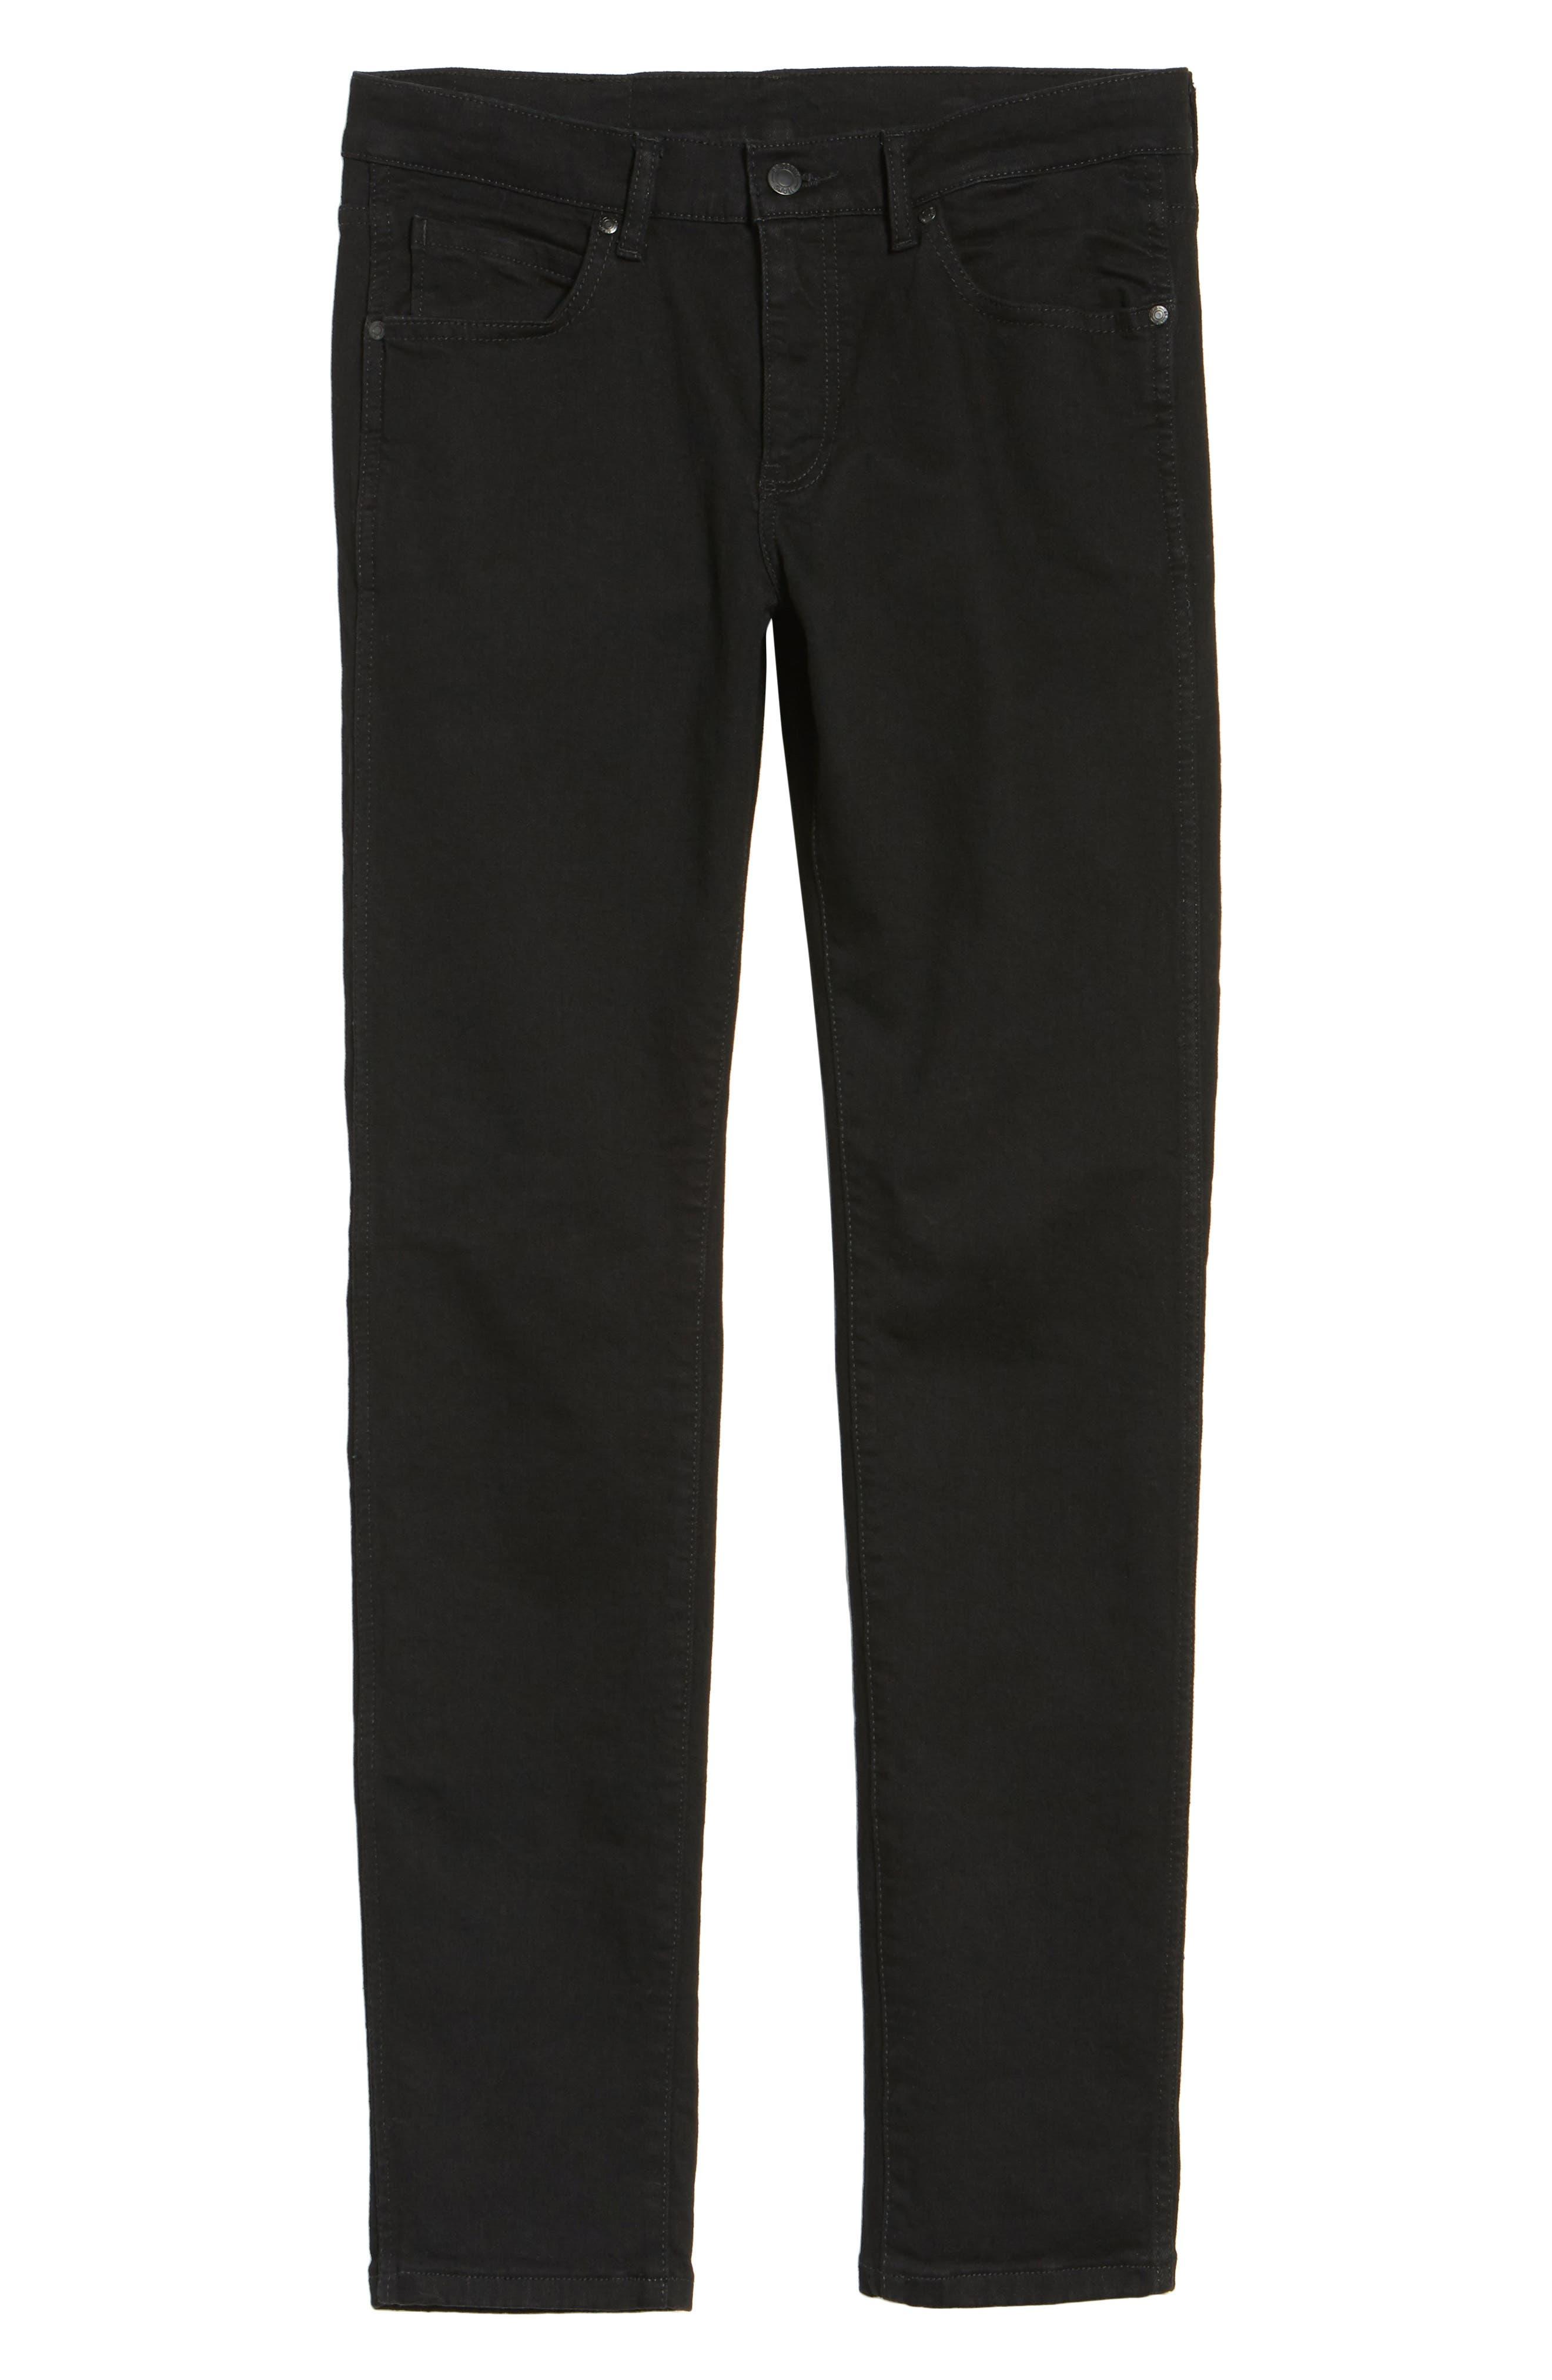 Snap Skinny Fit Jeans,                             Alternate thumbnail 6, color,                             Organic Black